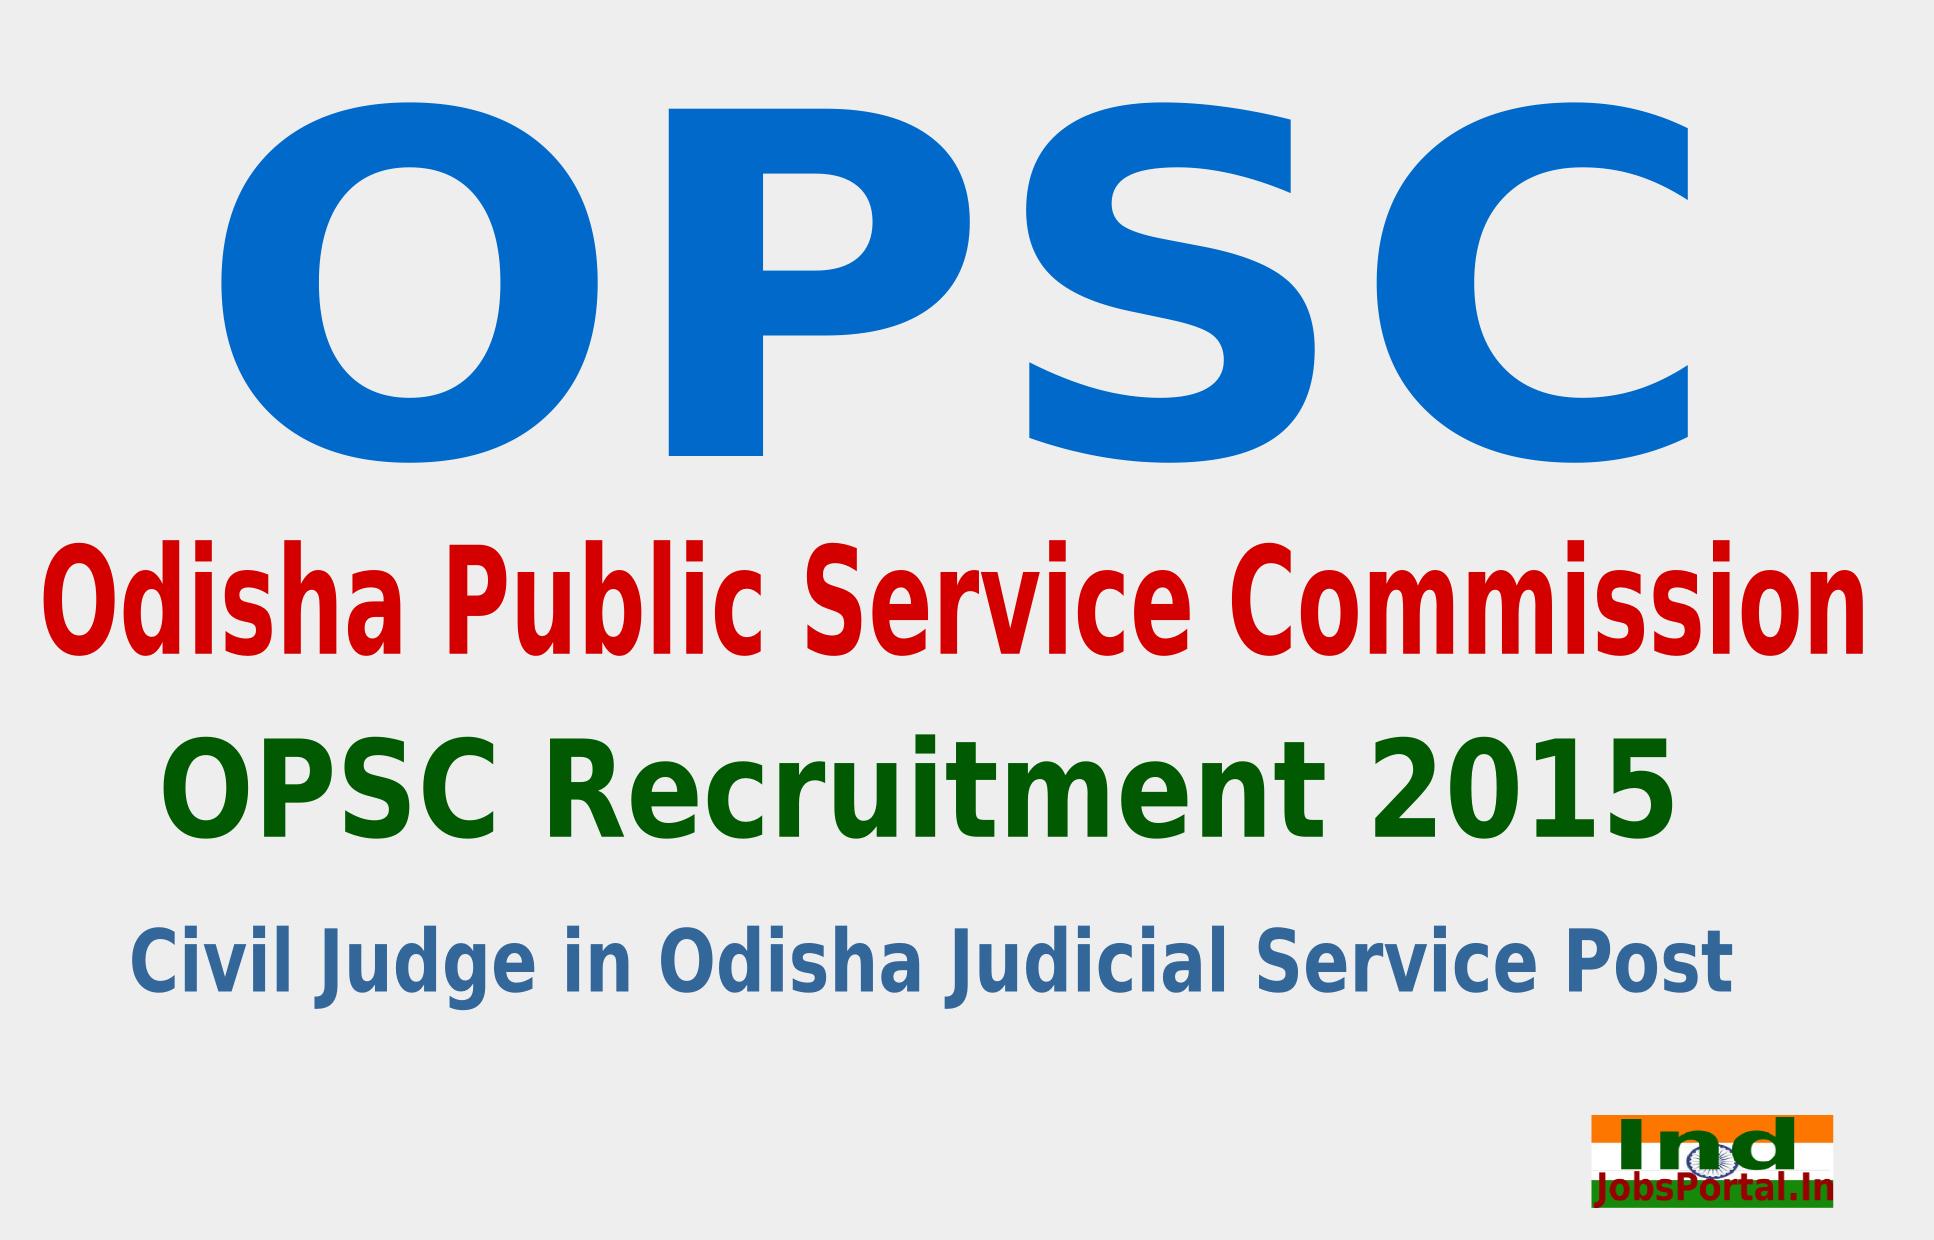 OPSC Recruitment 2015 Online Application For 69 Civil Judge in Odisha Judicial Service Post